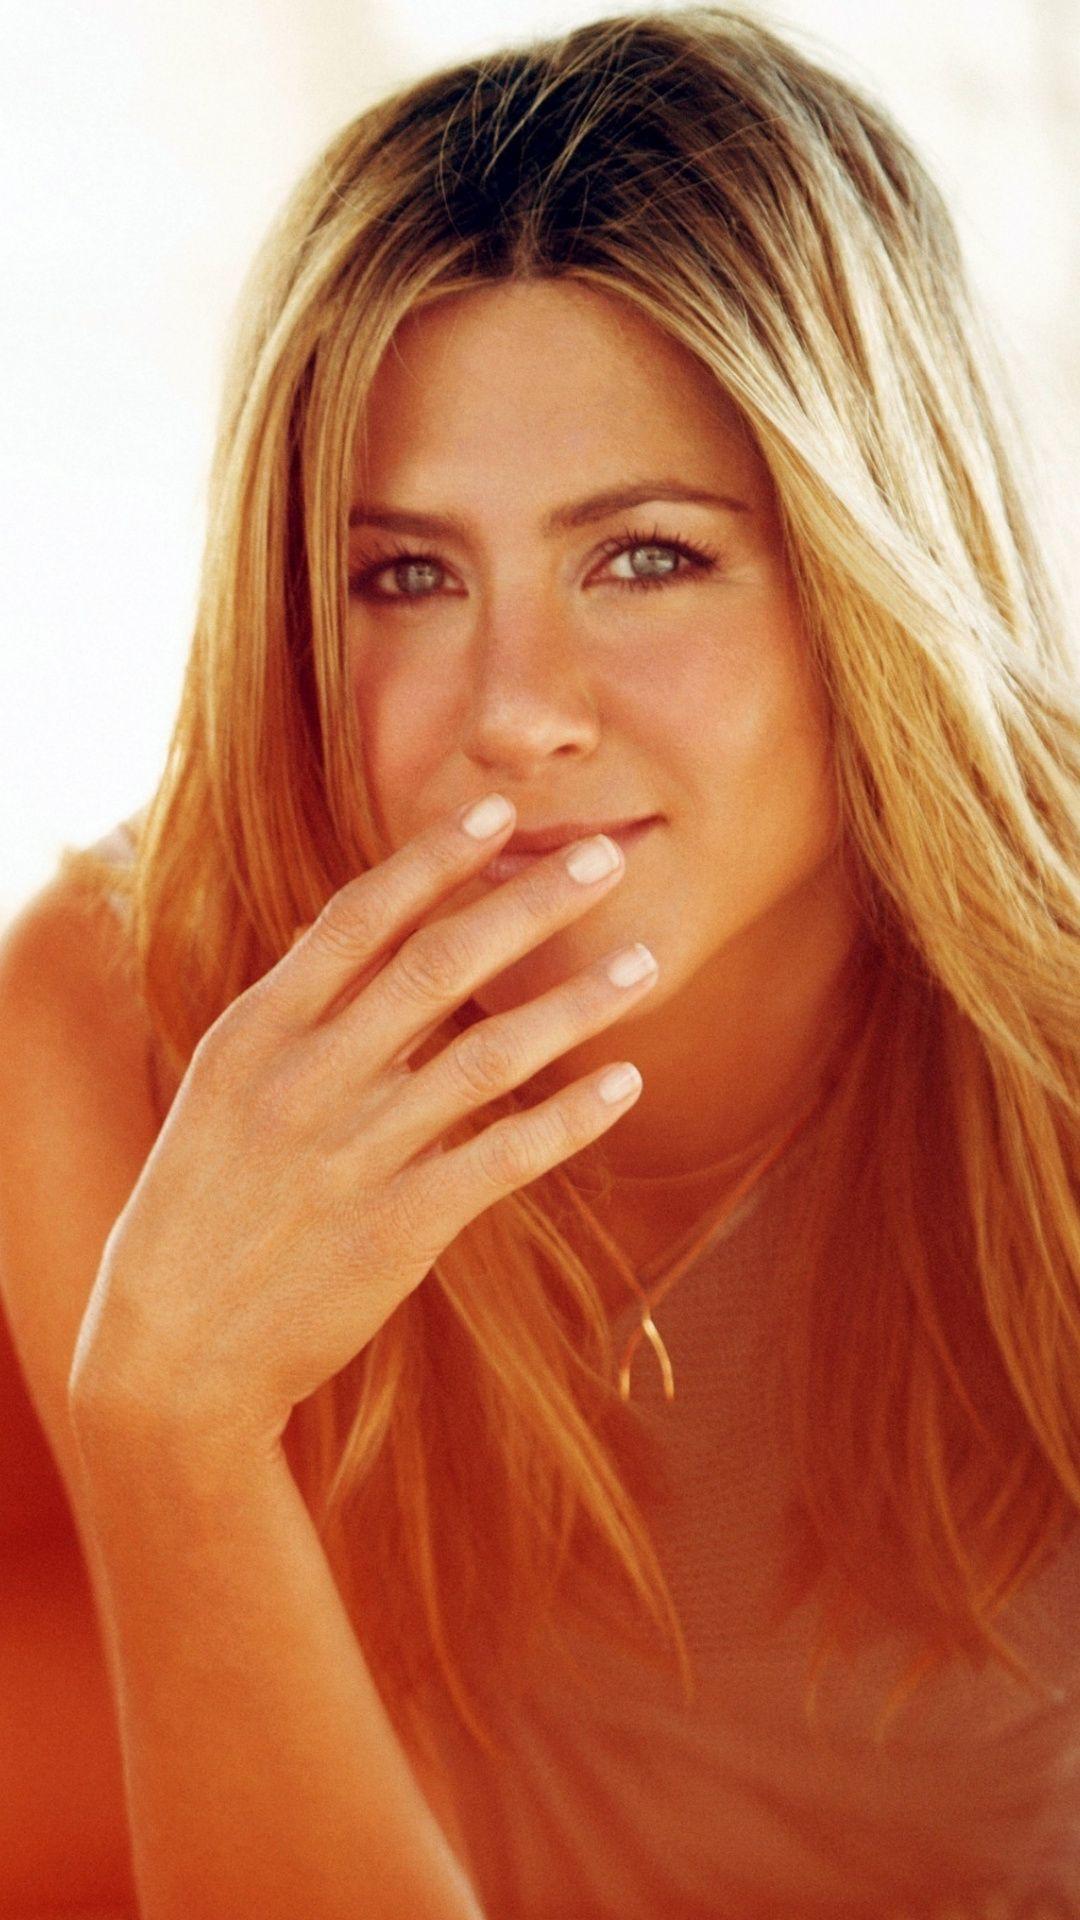 Actress Celebrity Smile Jennifer Aniston 1080x1920 Wallpaper